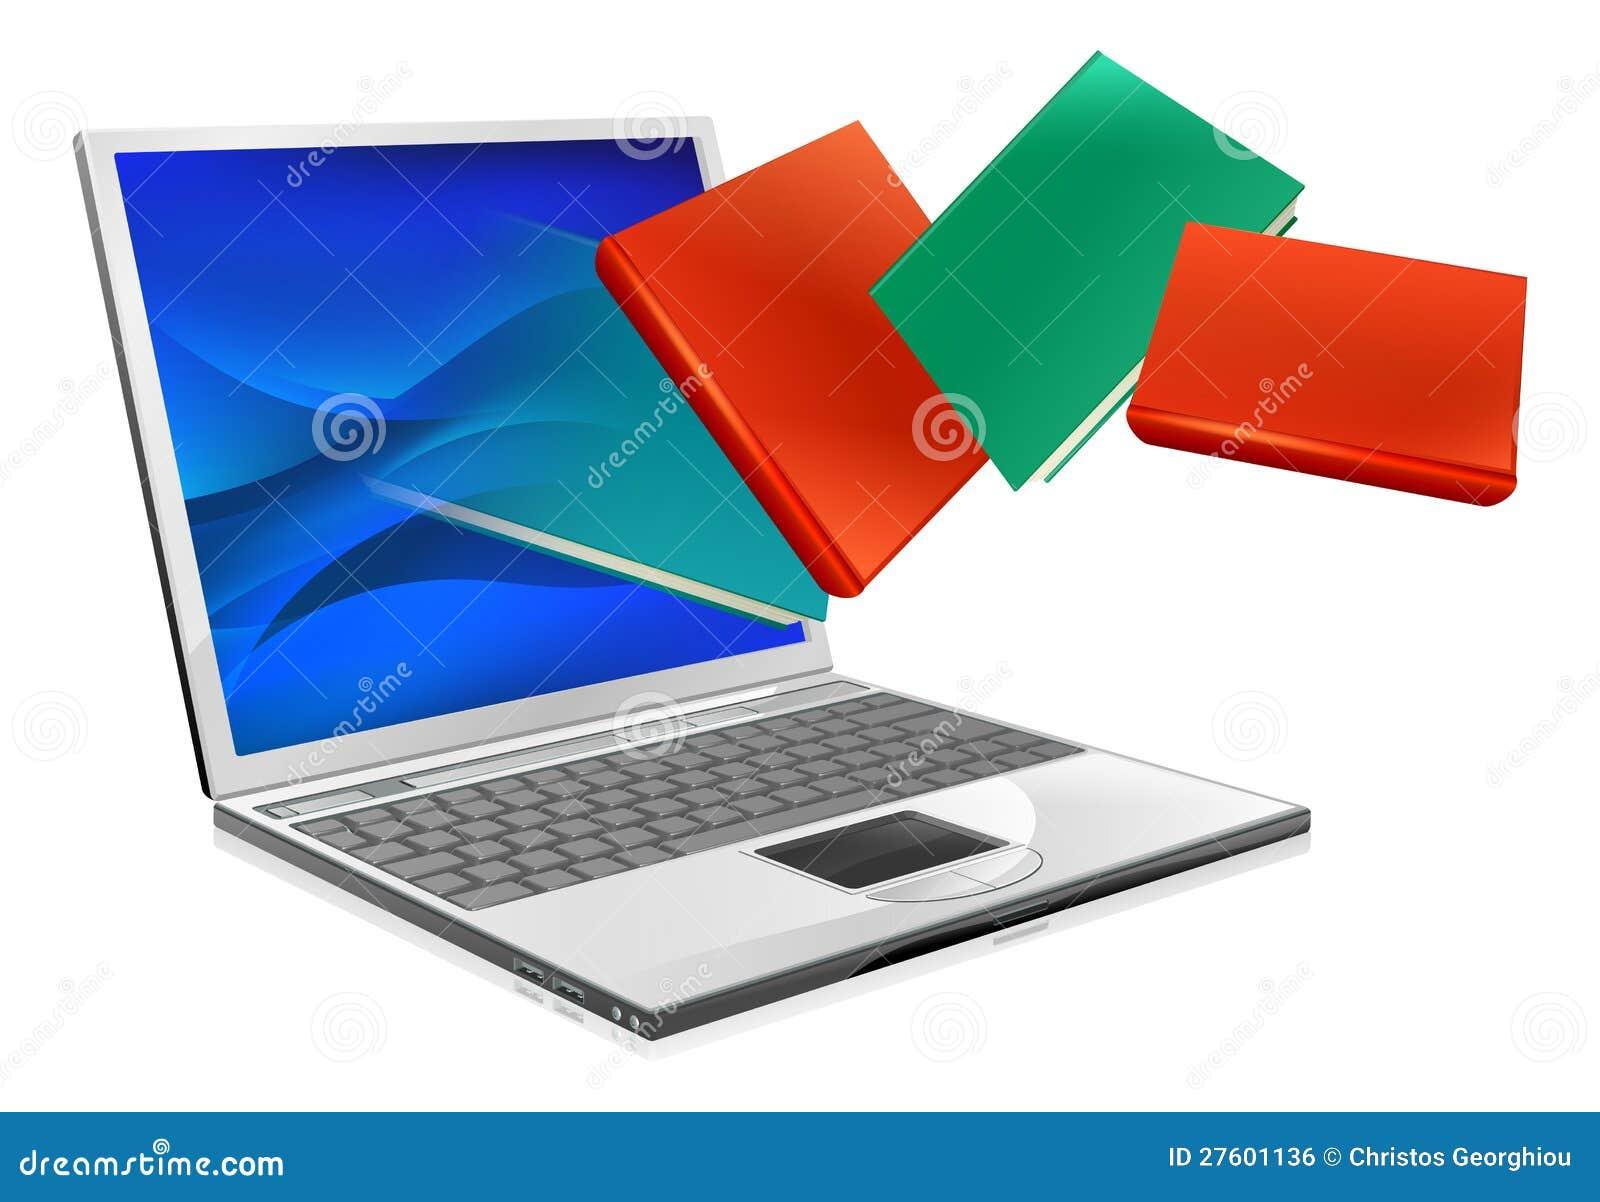 concept of online education pdf